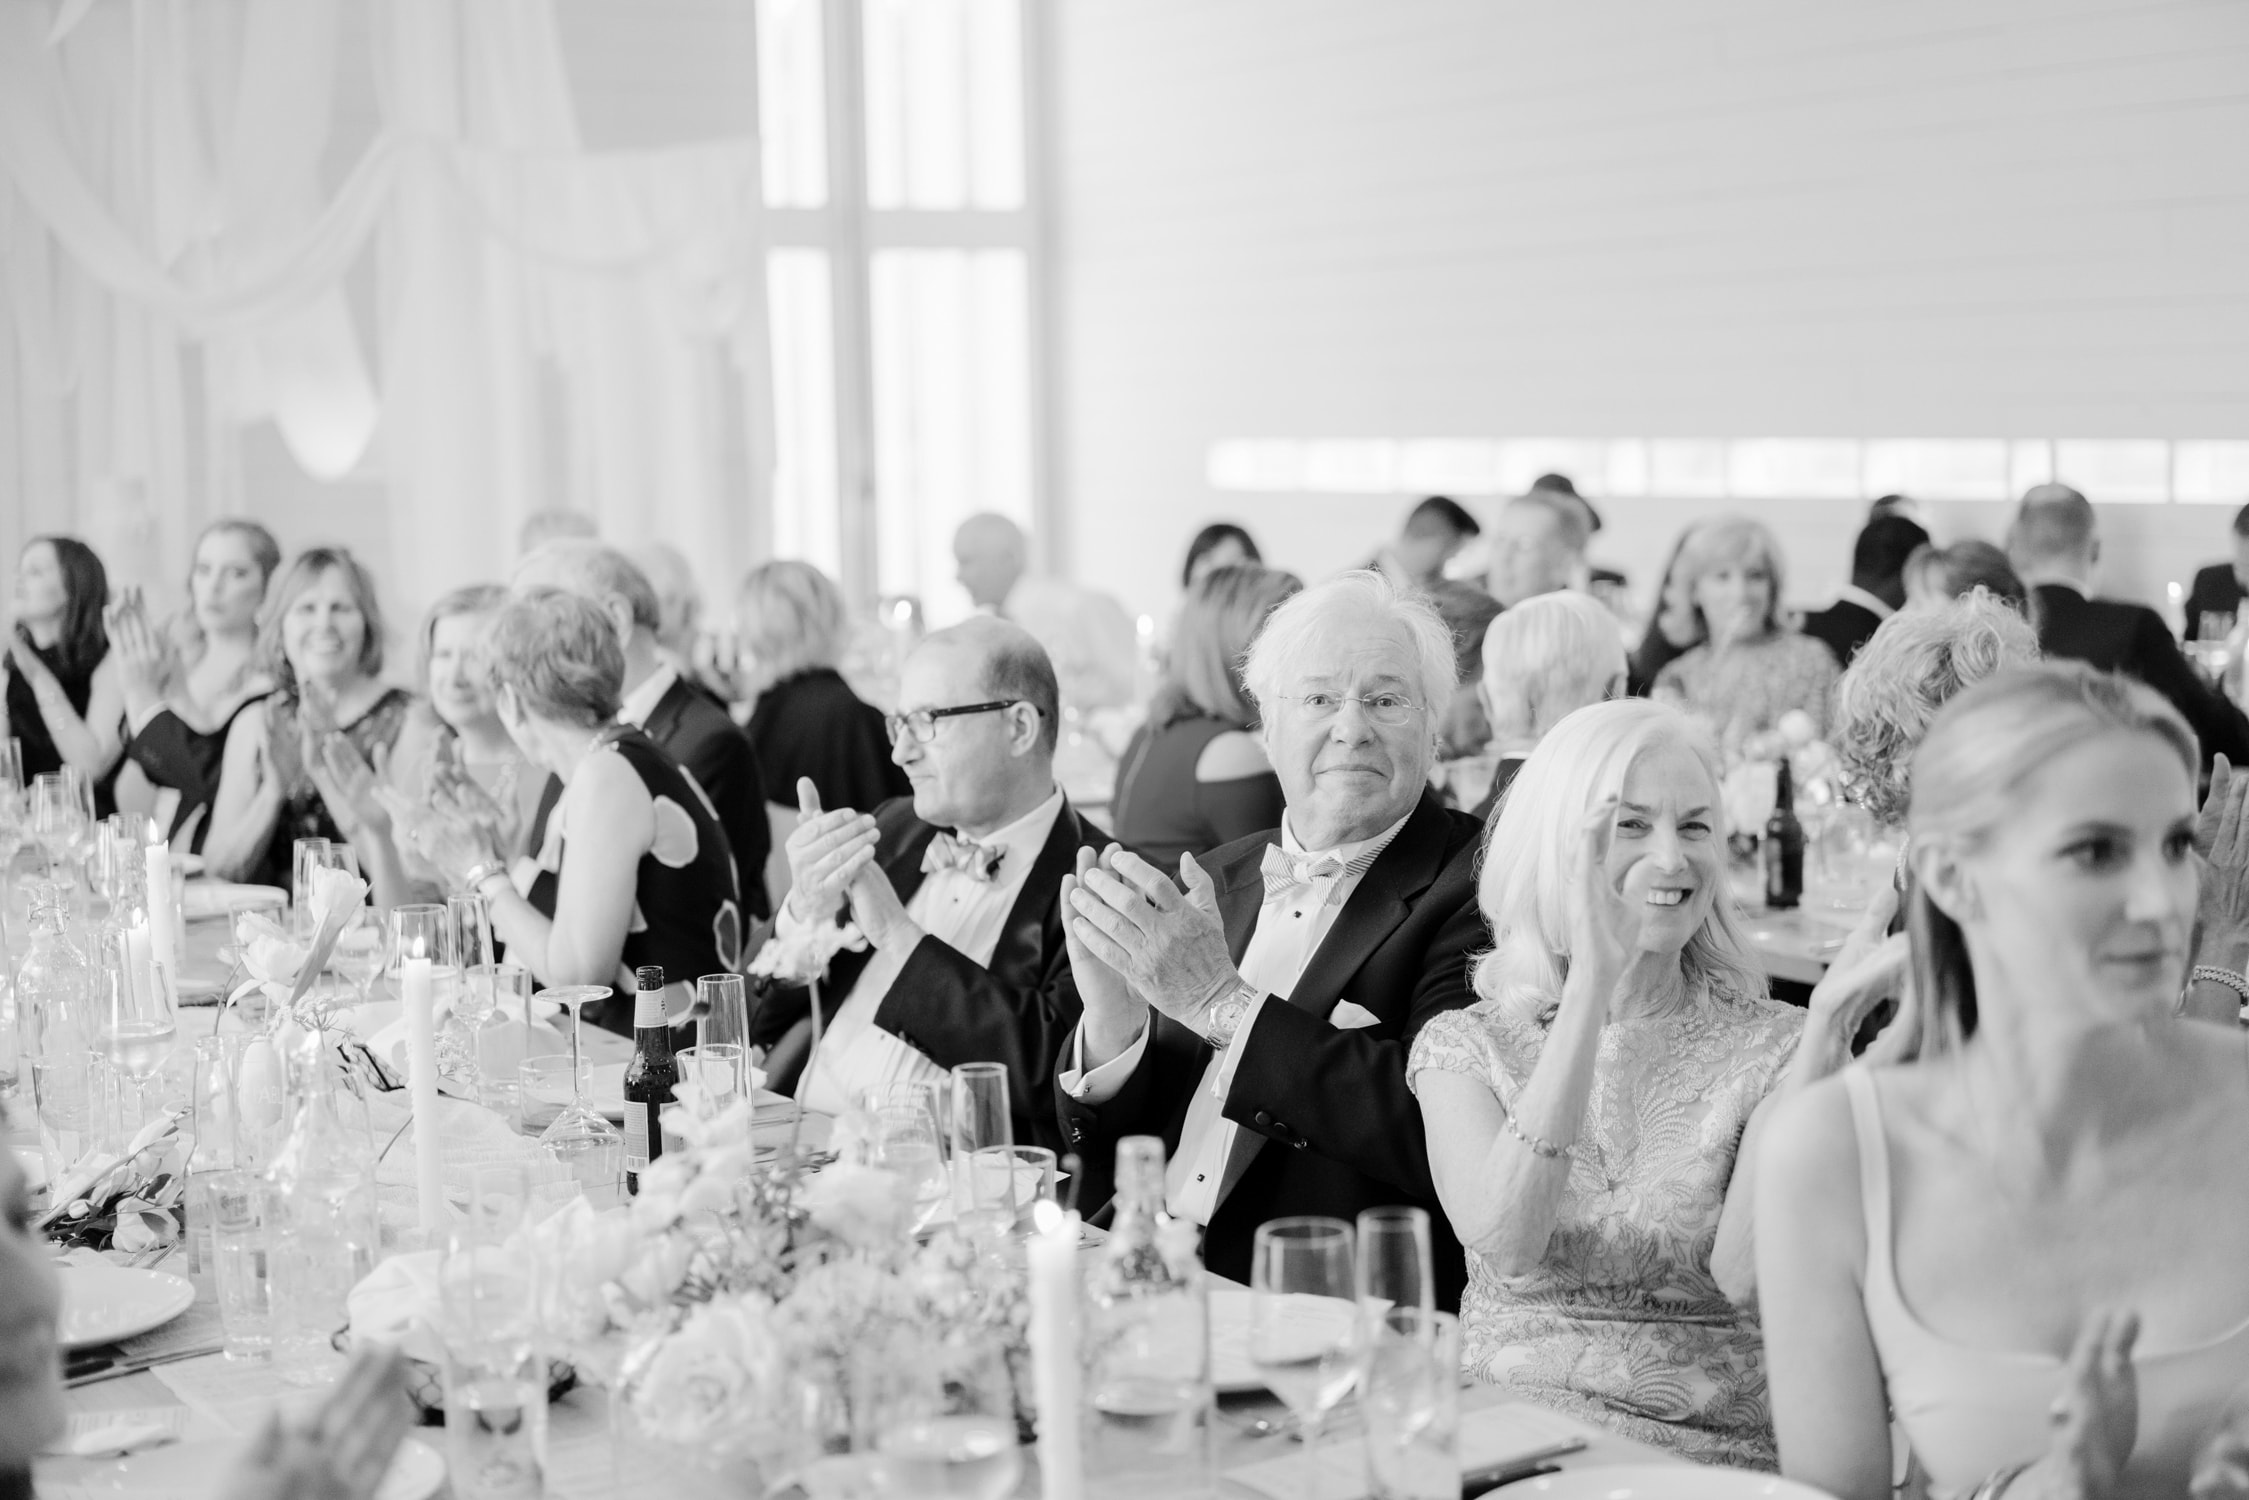 PROSPECT_HOUSE_WEDDING_AUSTIN_TX_MATTHEW_MOORE-00766-2.jpg